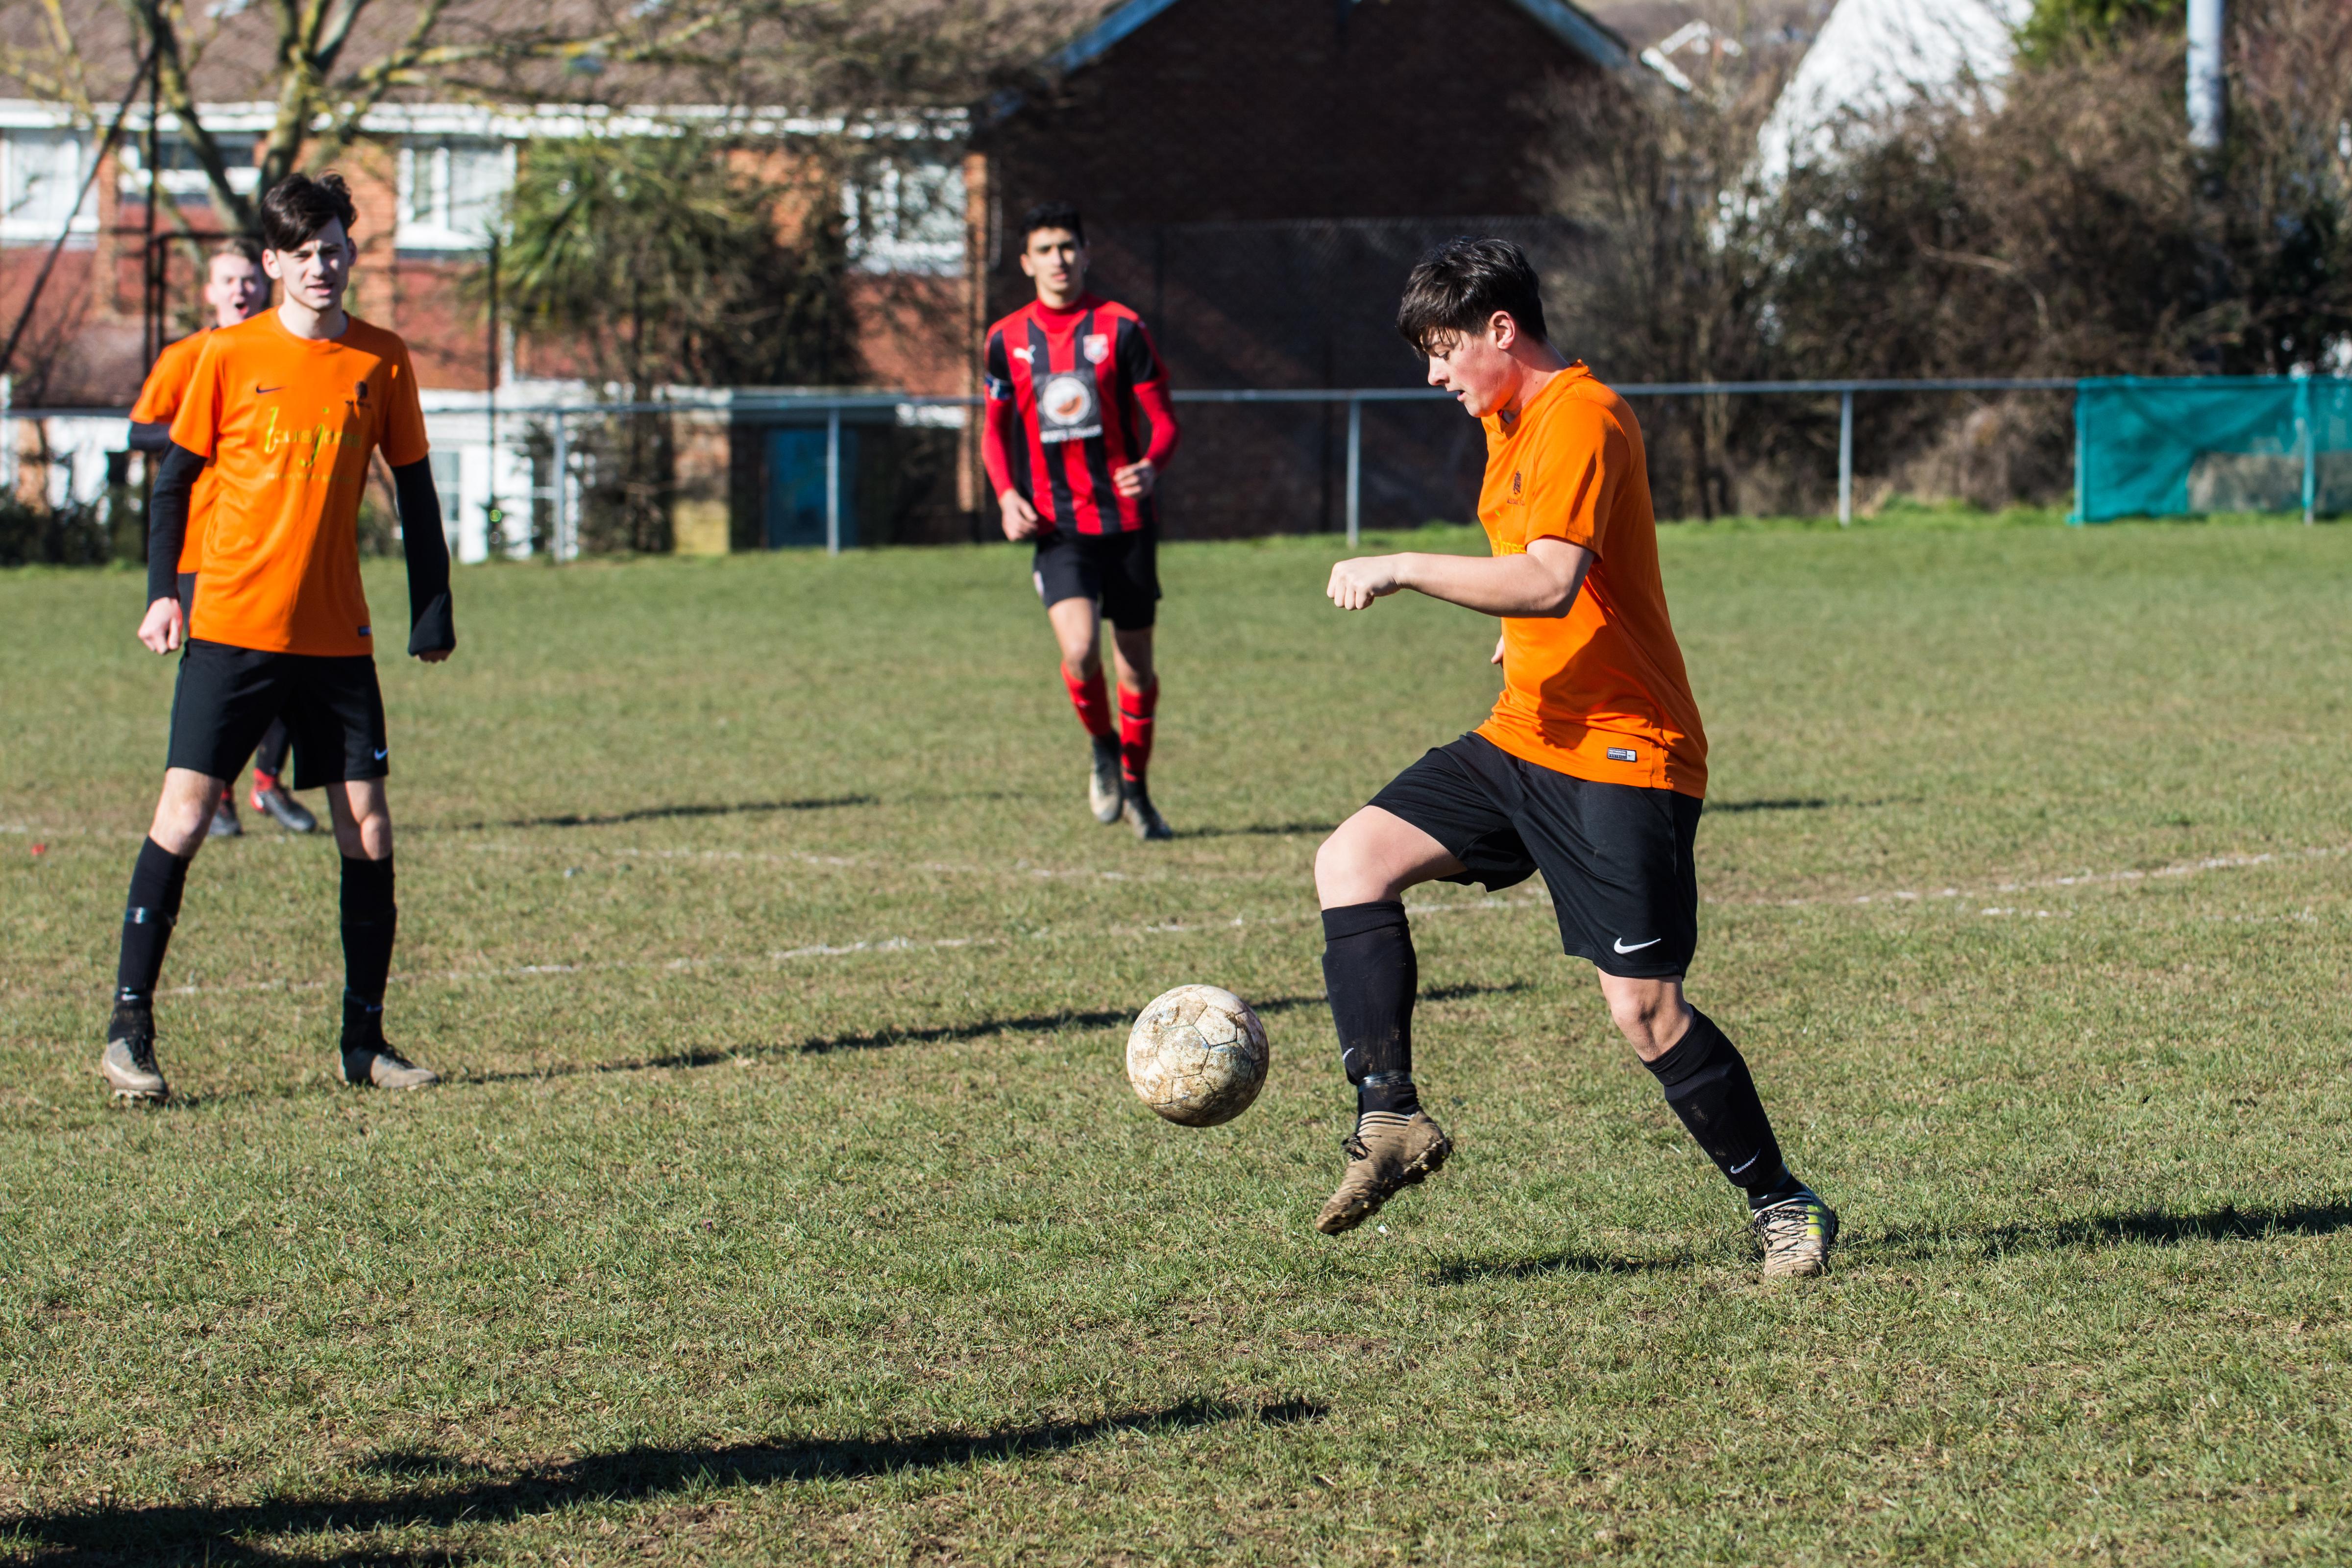 Mile Oak FC U18s vs Southwick FC U18s 25.02.18 05 DAVID_JEFFERY